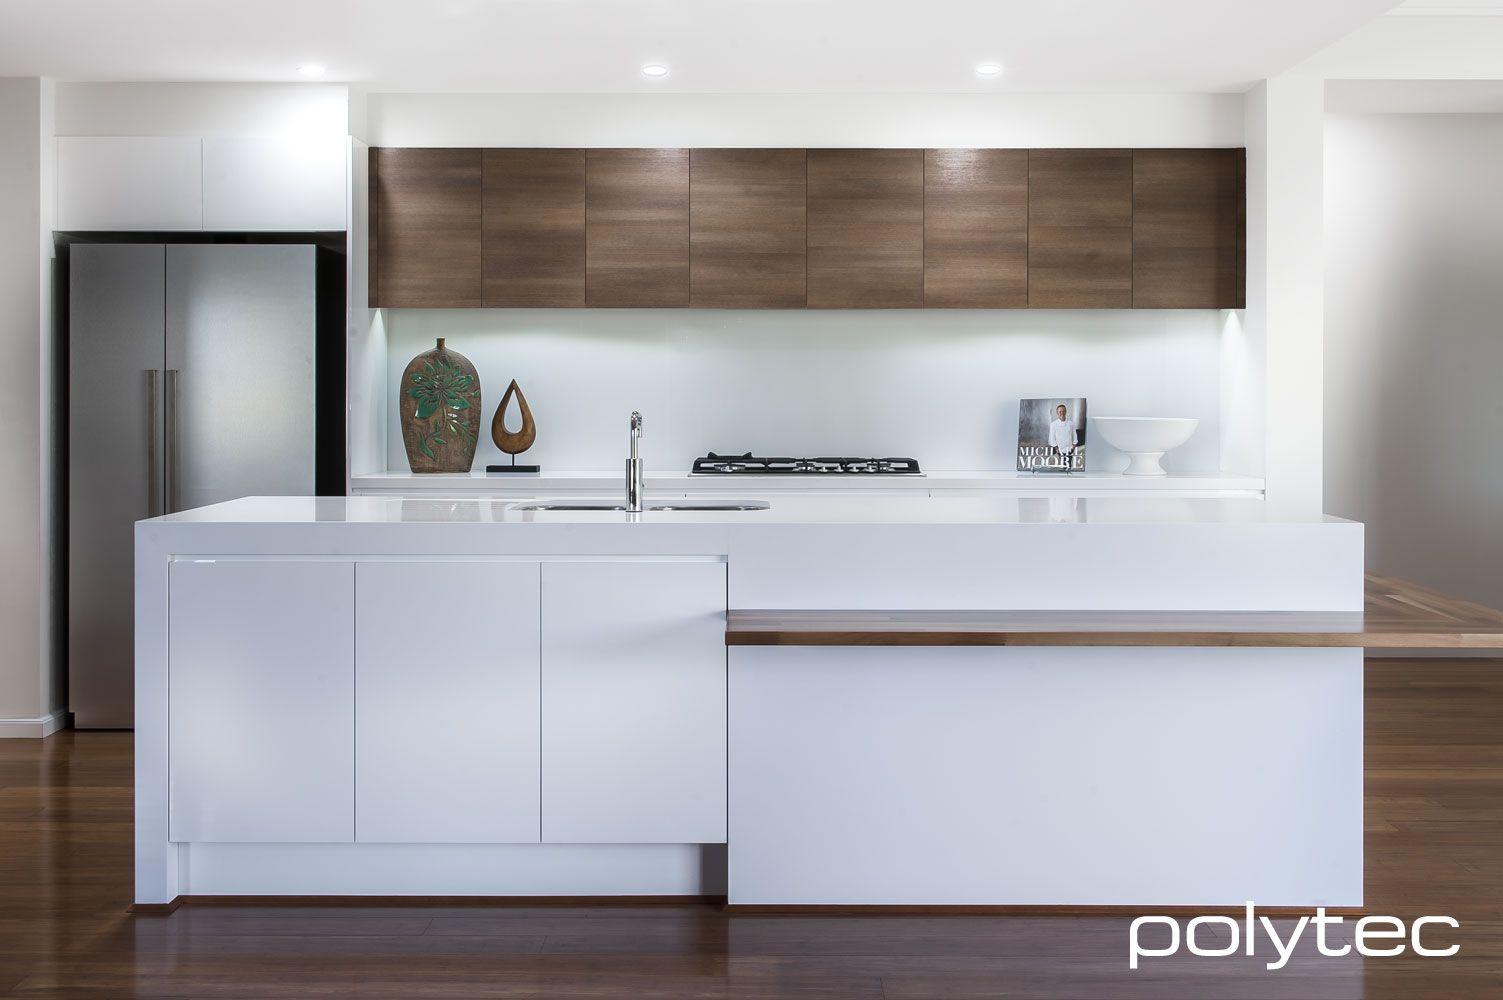 Doors in createc ultra white overhead cupboards in ravine for Overhead kitchen cupboards